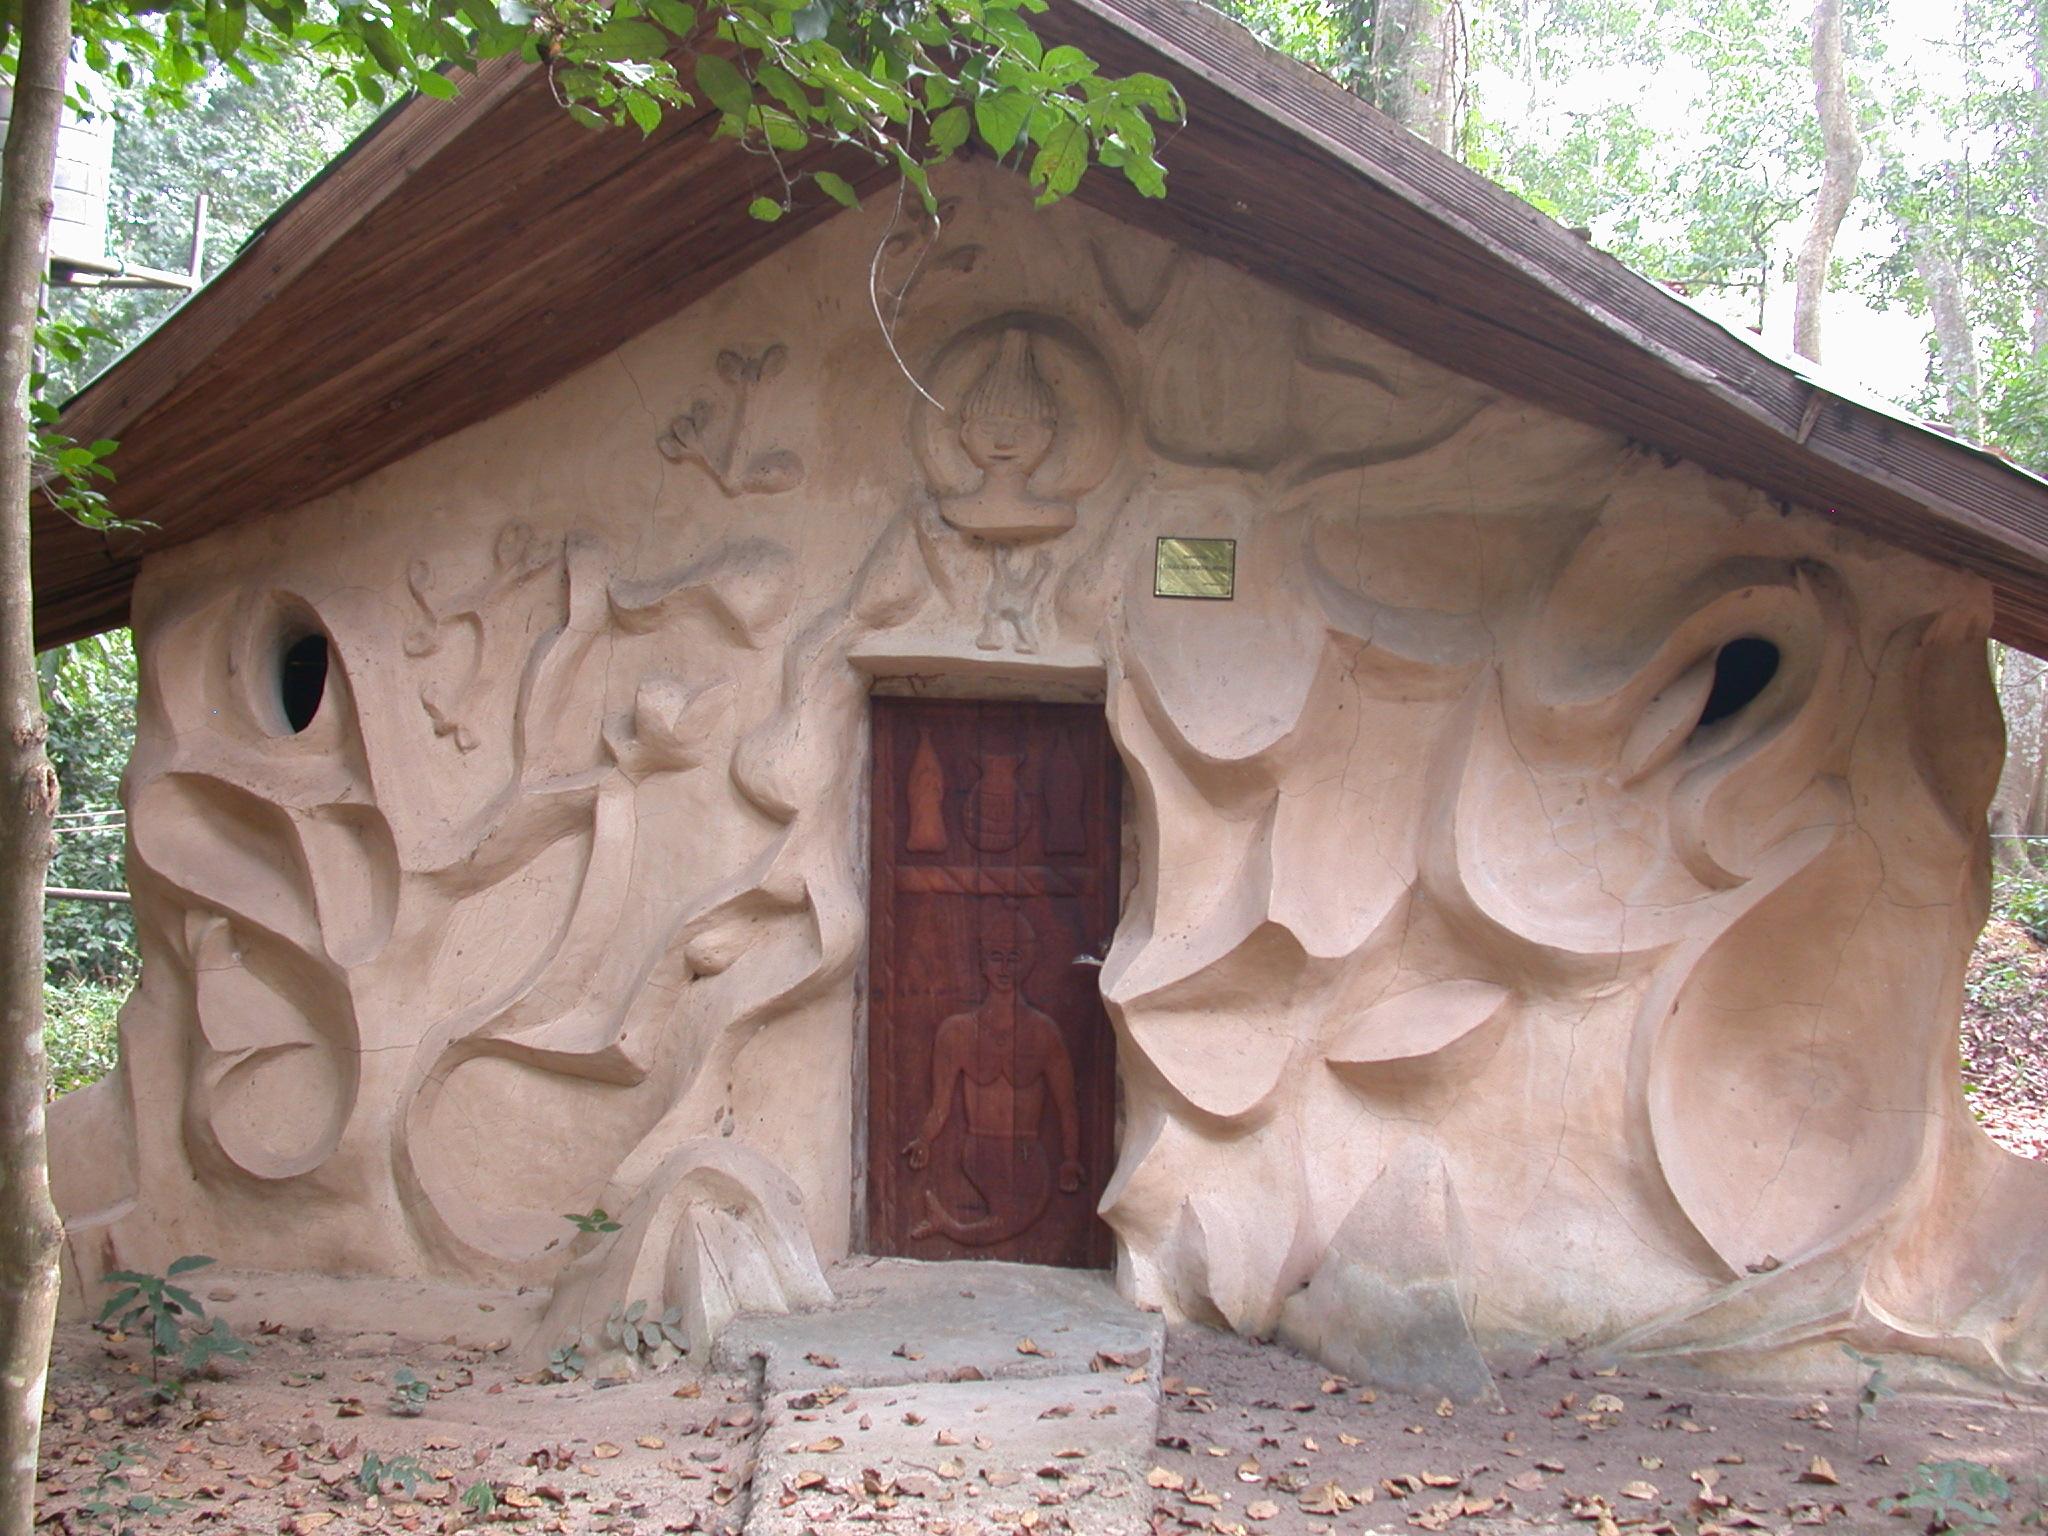 Meeting Building, Osun Sacred Grove, Oshogbo, Nigeria